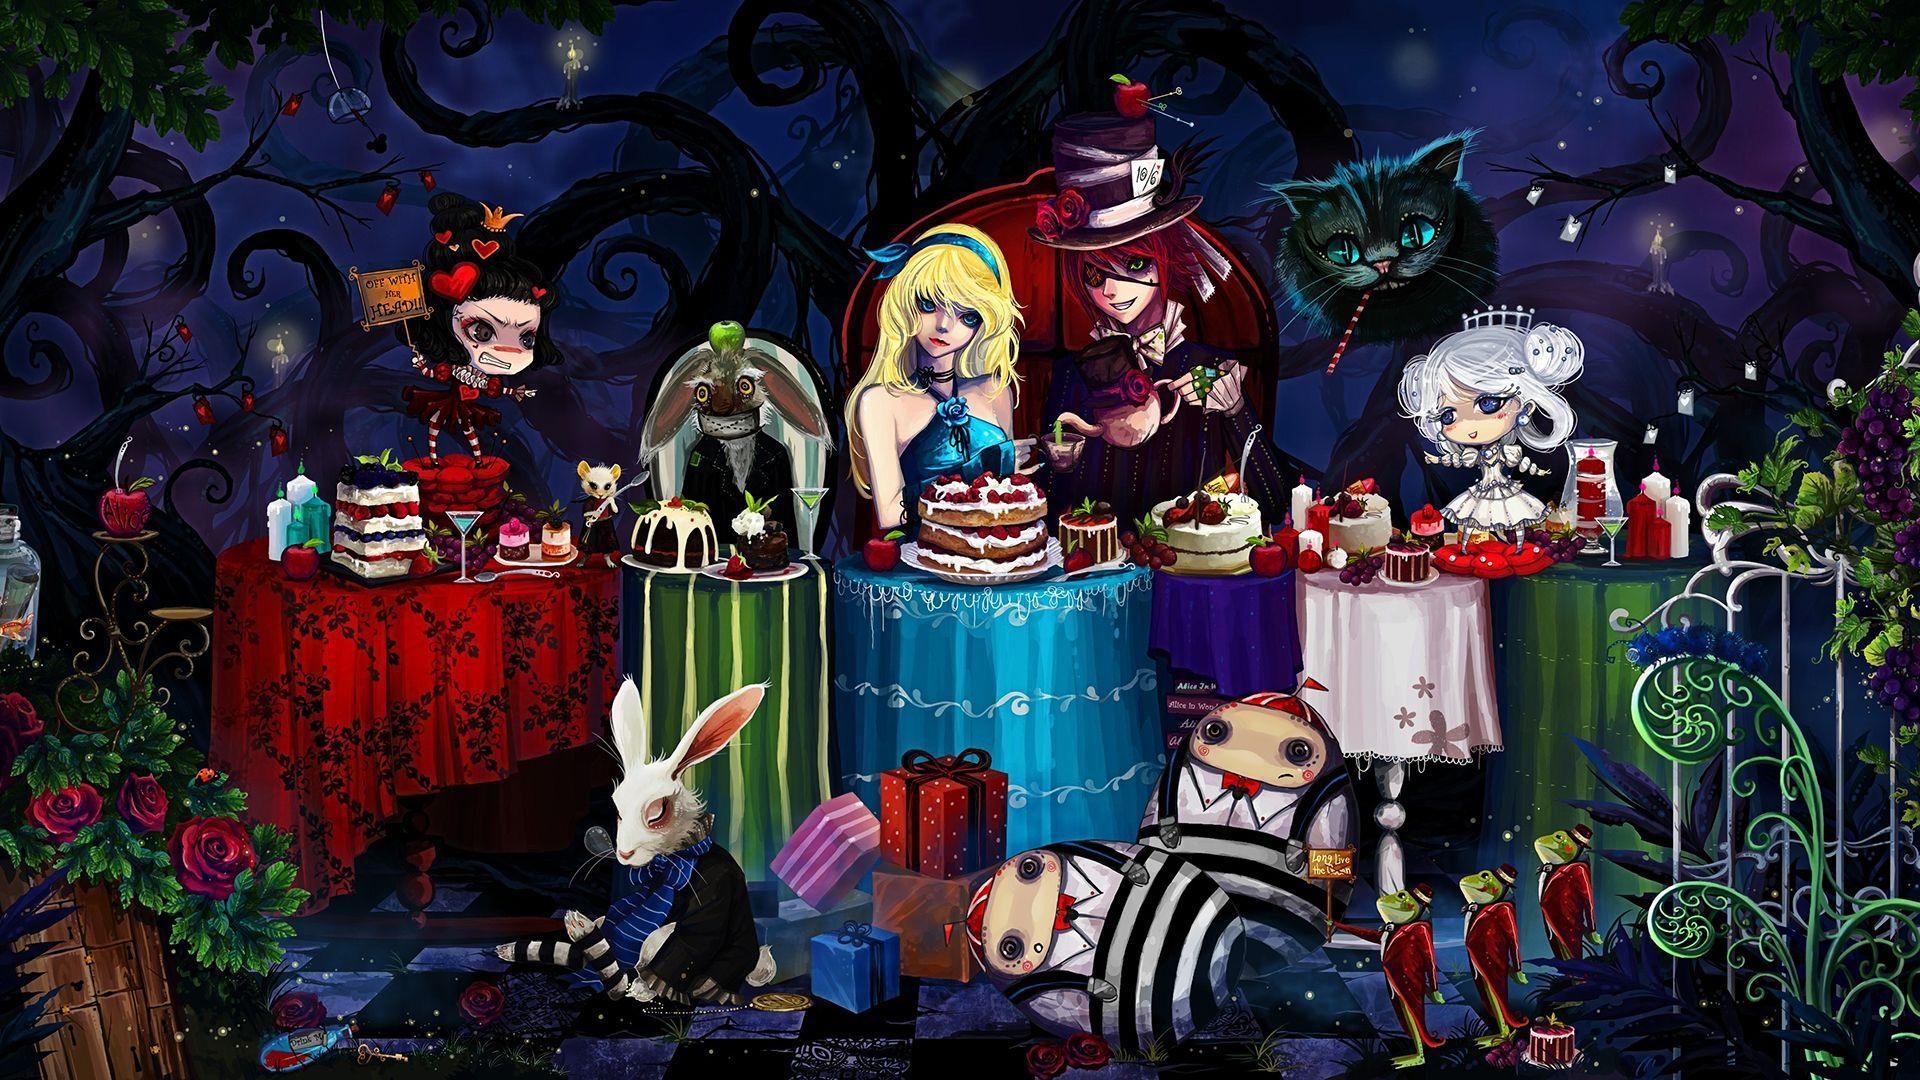 Alice in Wonderland Trippy Wallpapers - Top Free Alice in ...